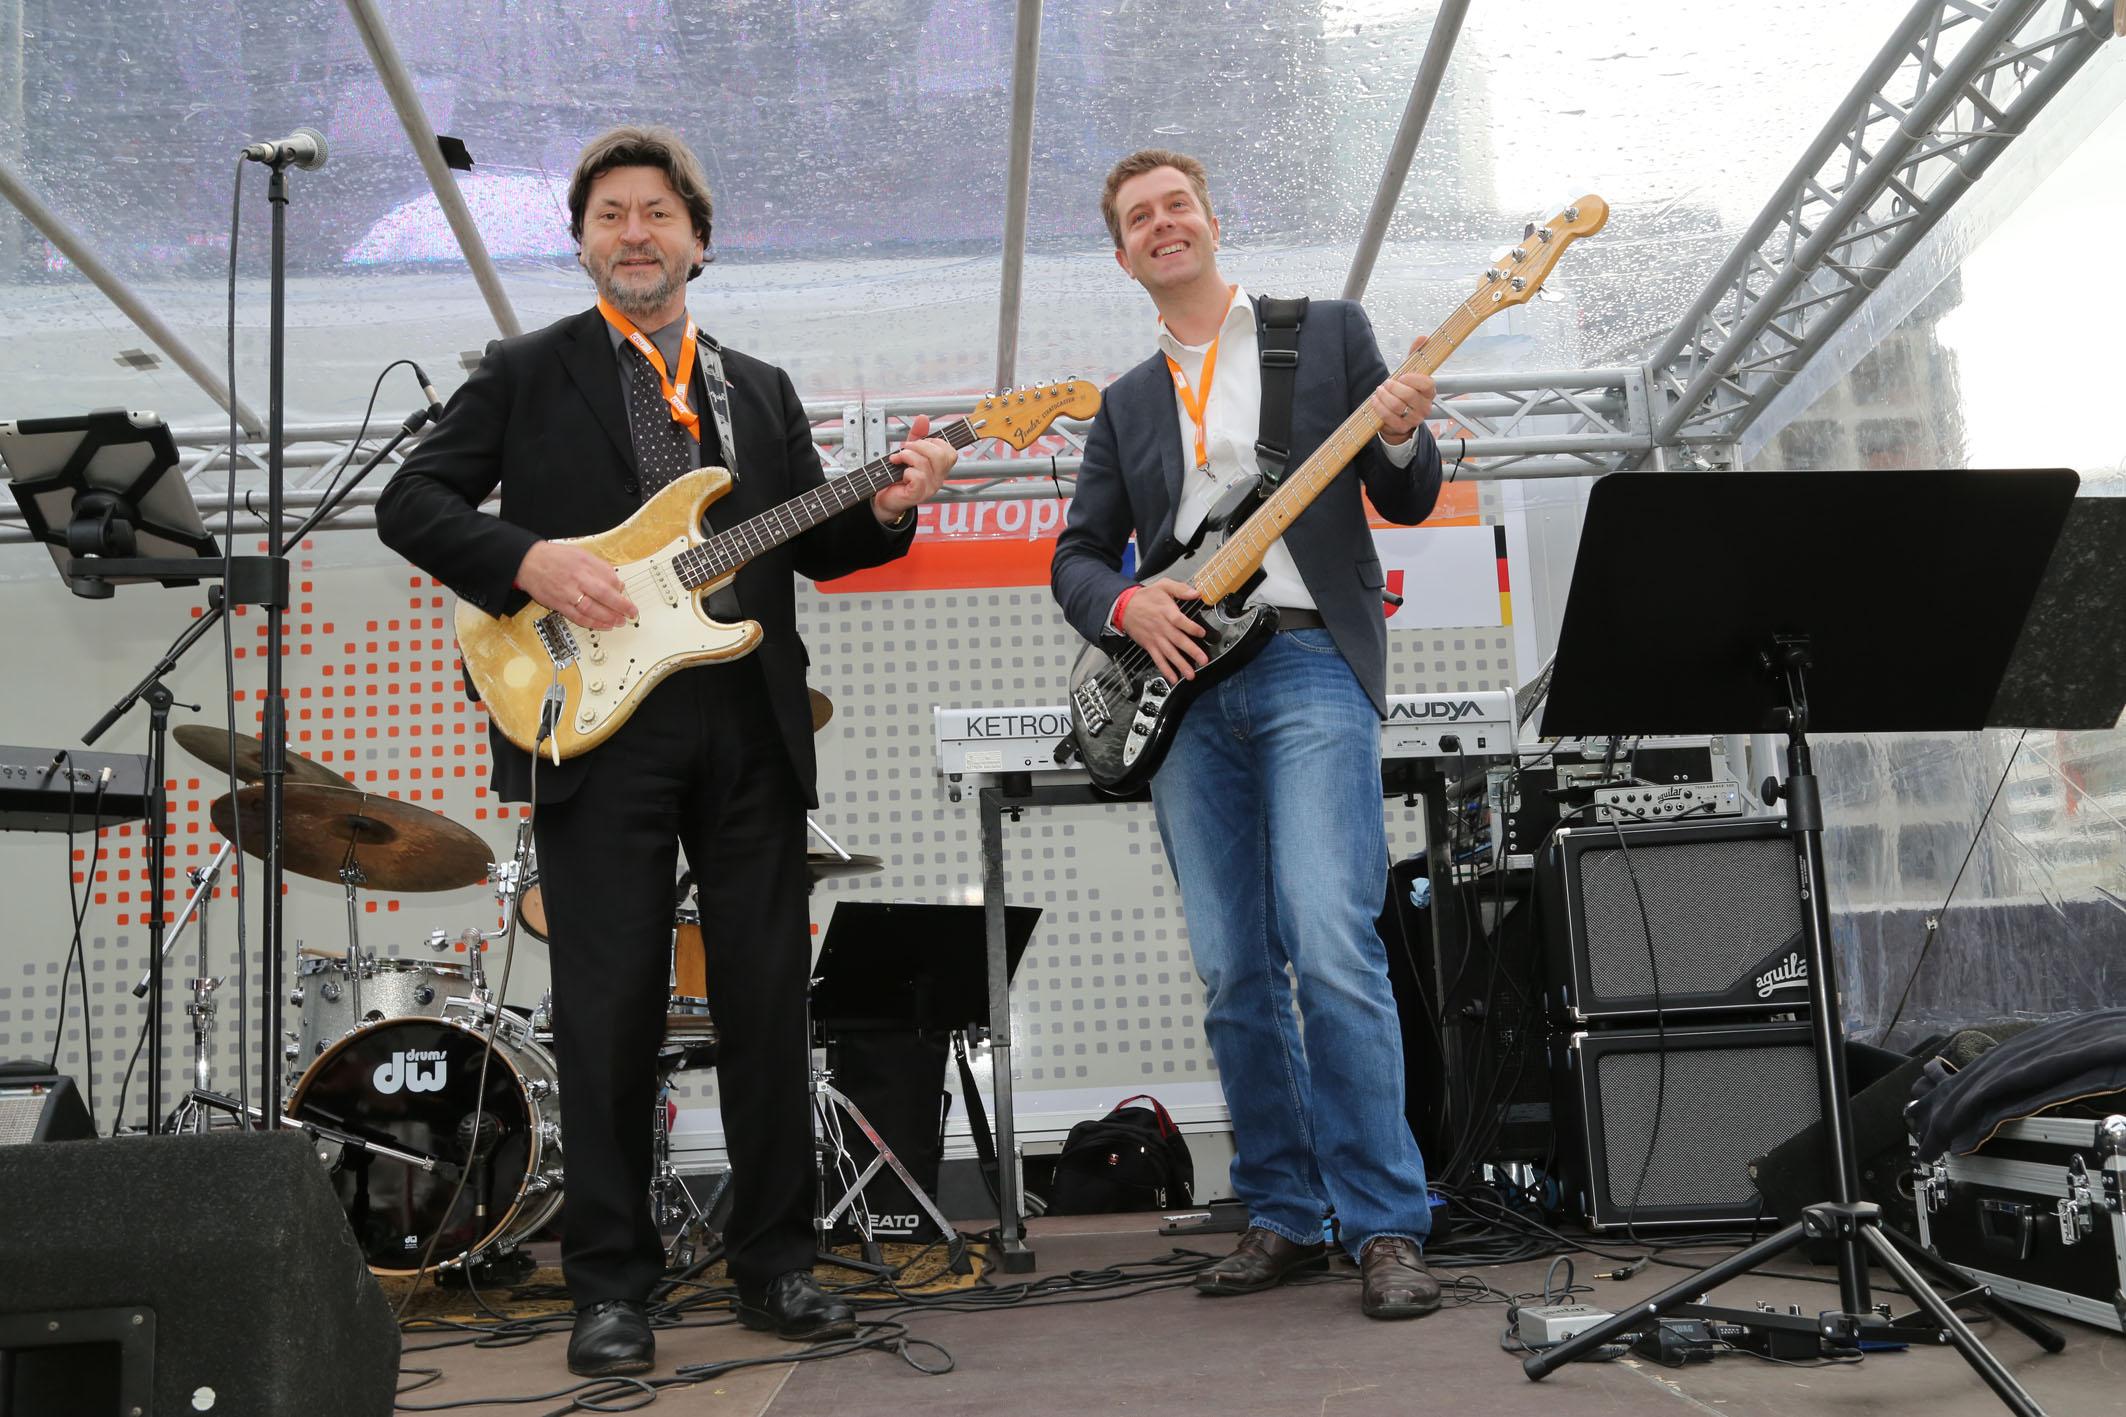 Joachim Zeller und Stefan Evers auf dem Europafest 2014 an der Gitarre